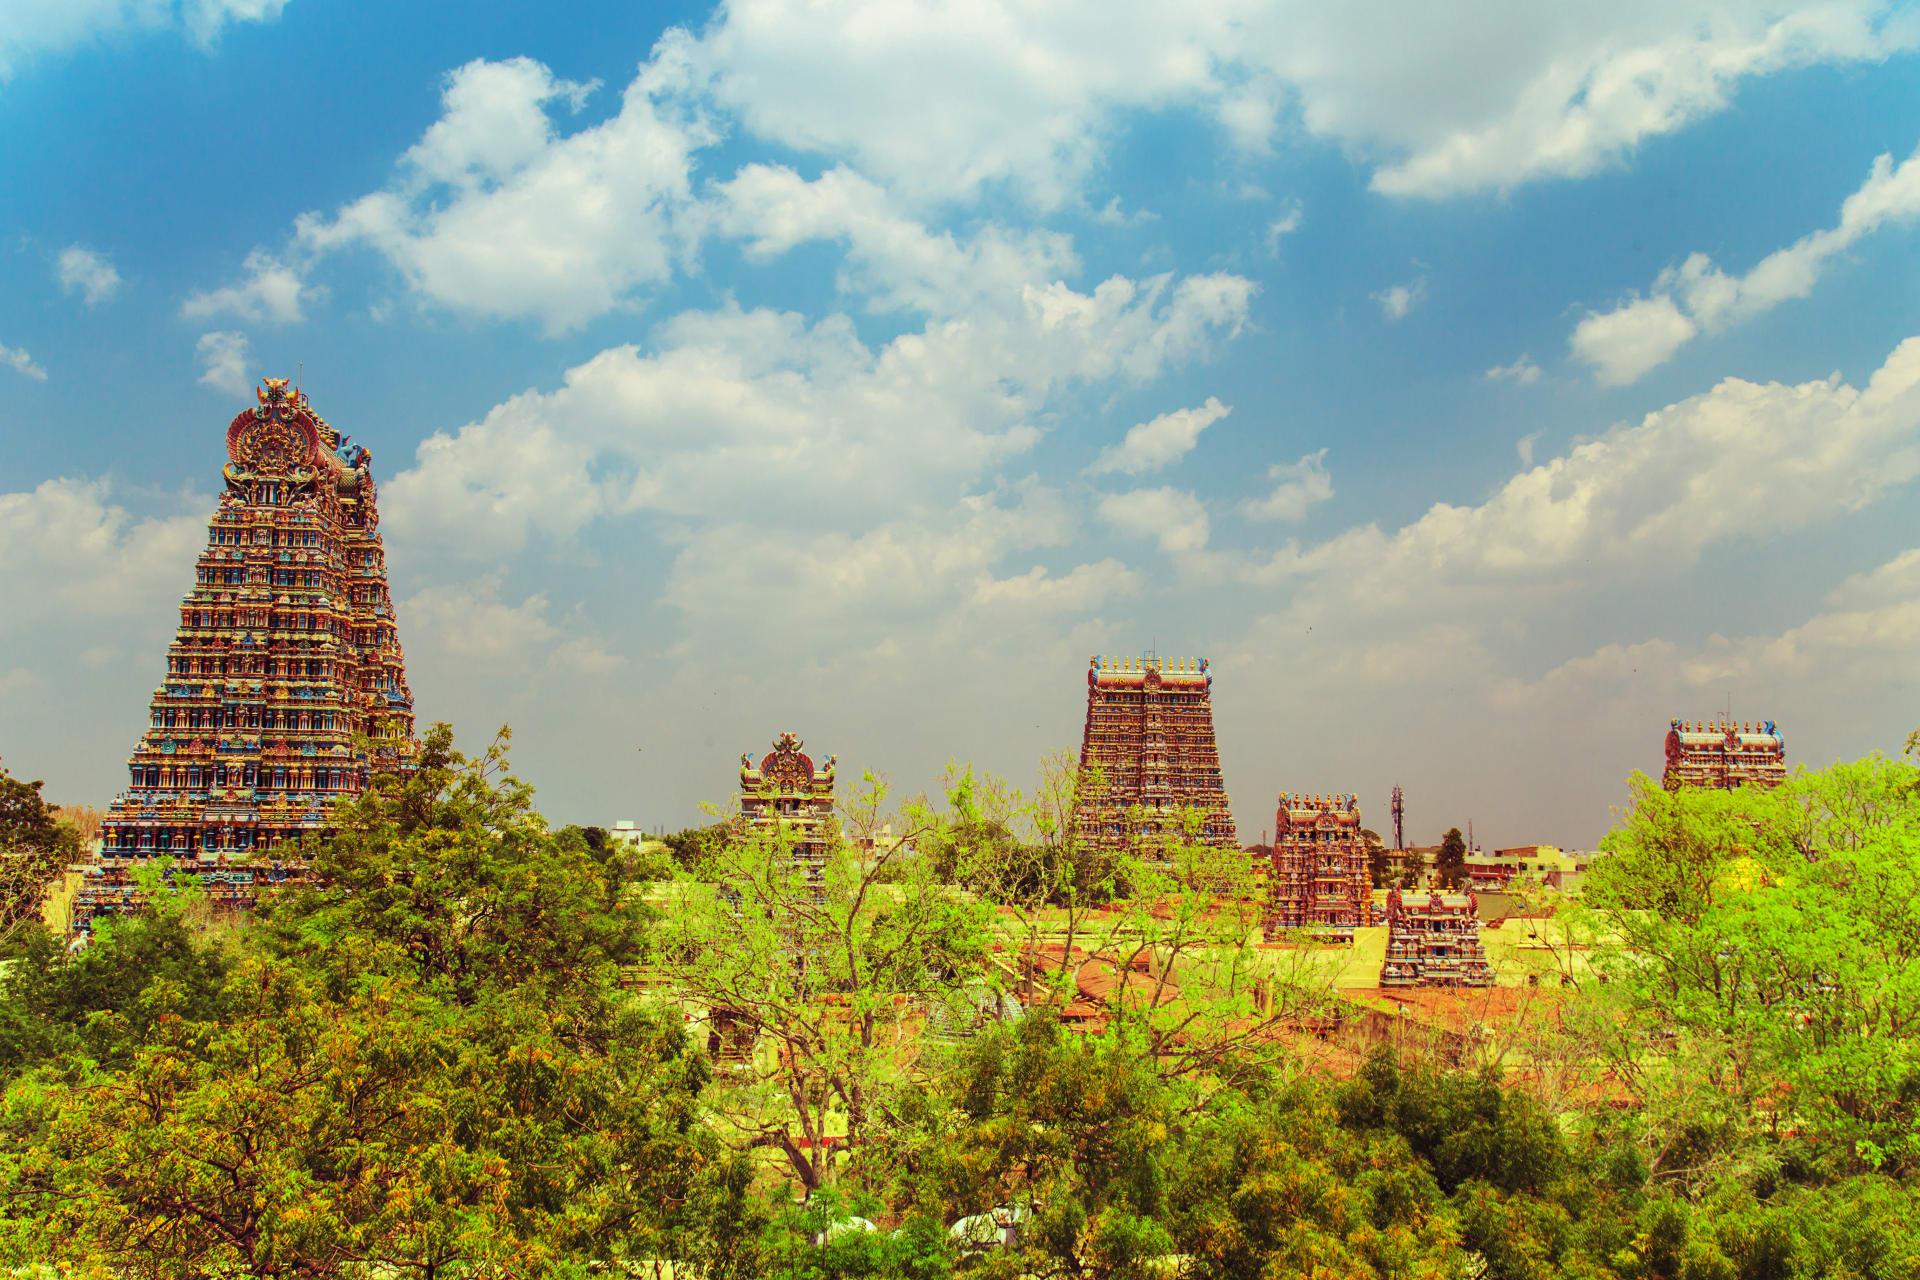 Madurai cover image